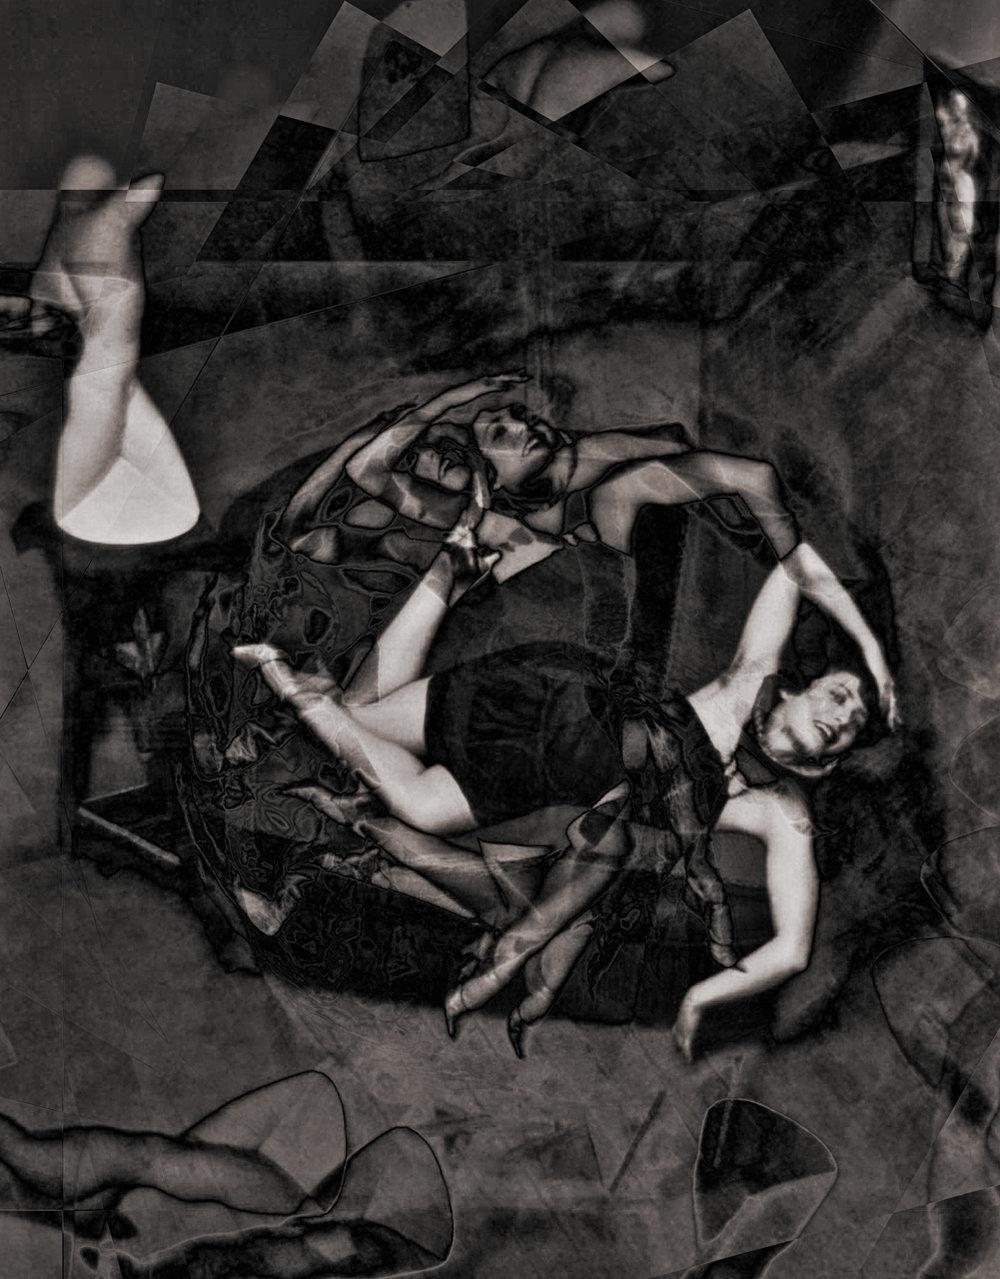 Kertesz, Andre (Satiric Dancer, 1926)